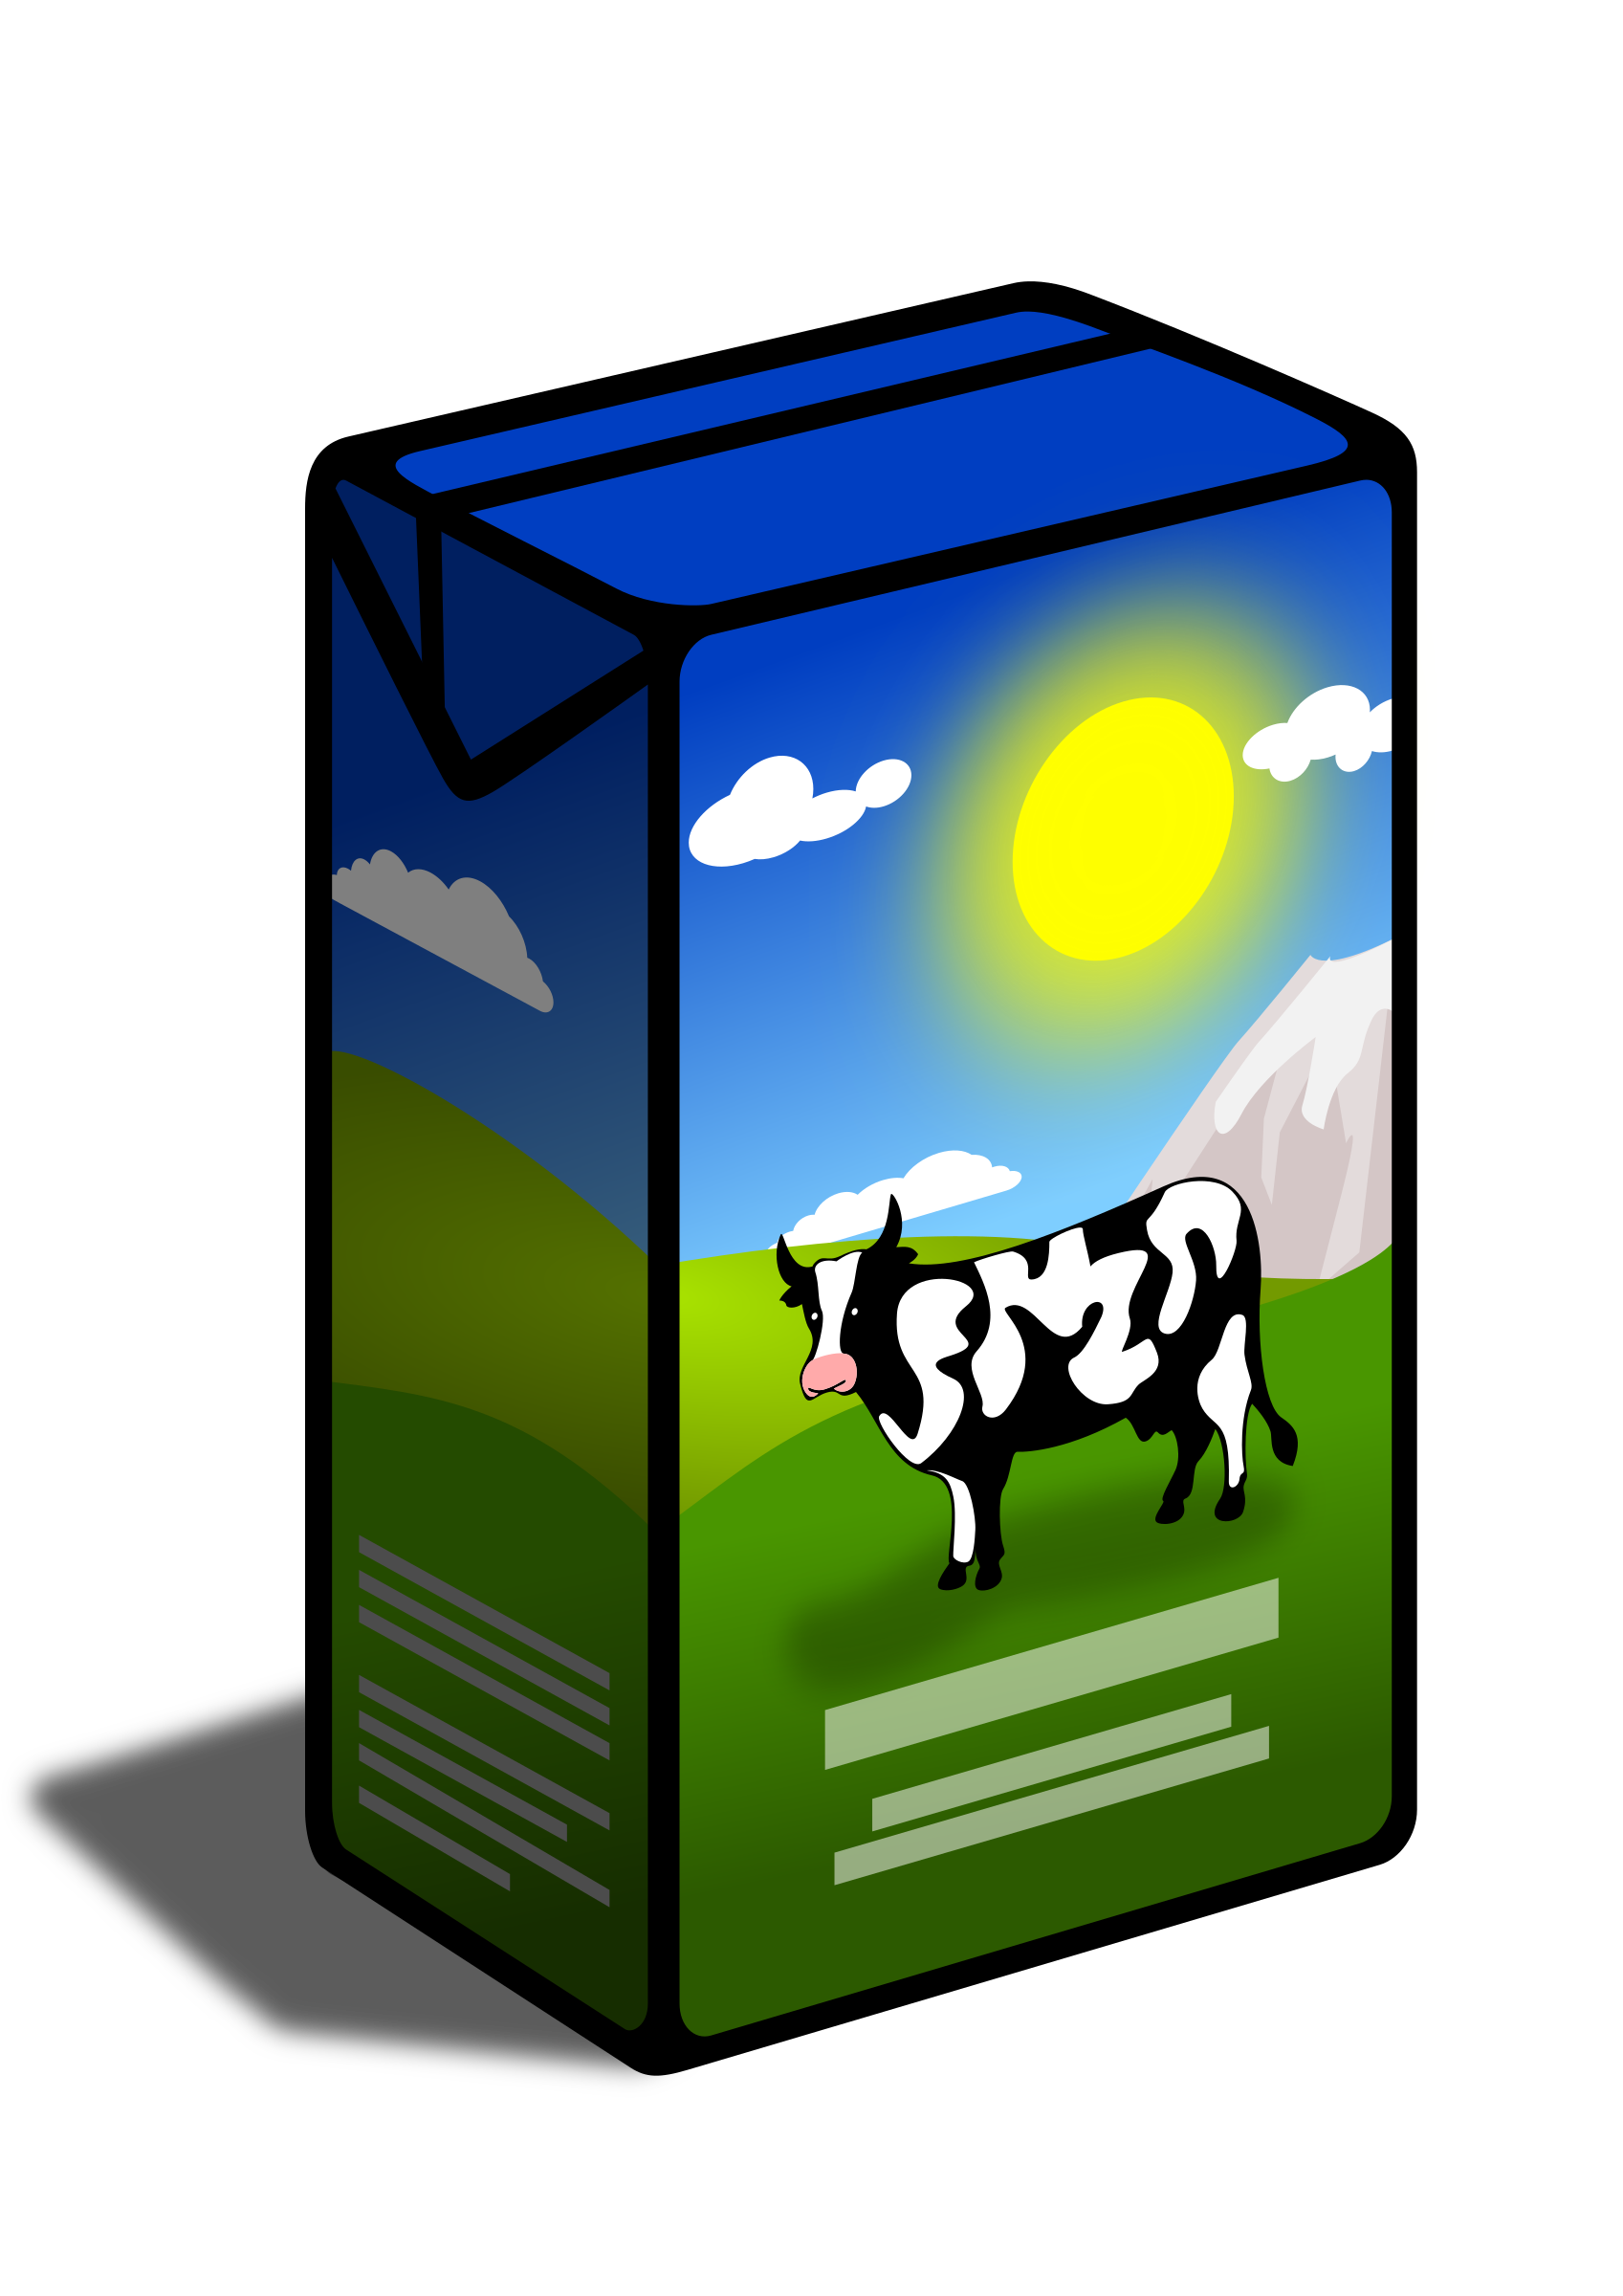 Milk Carton Microsoft Clipart - Clipart Kid